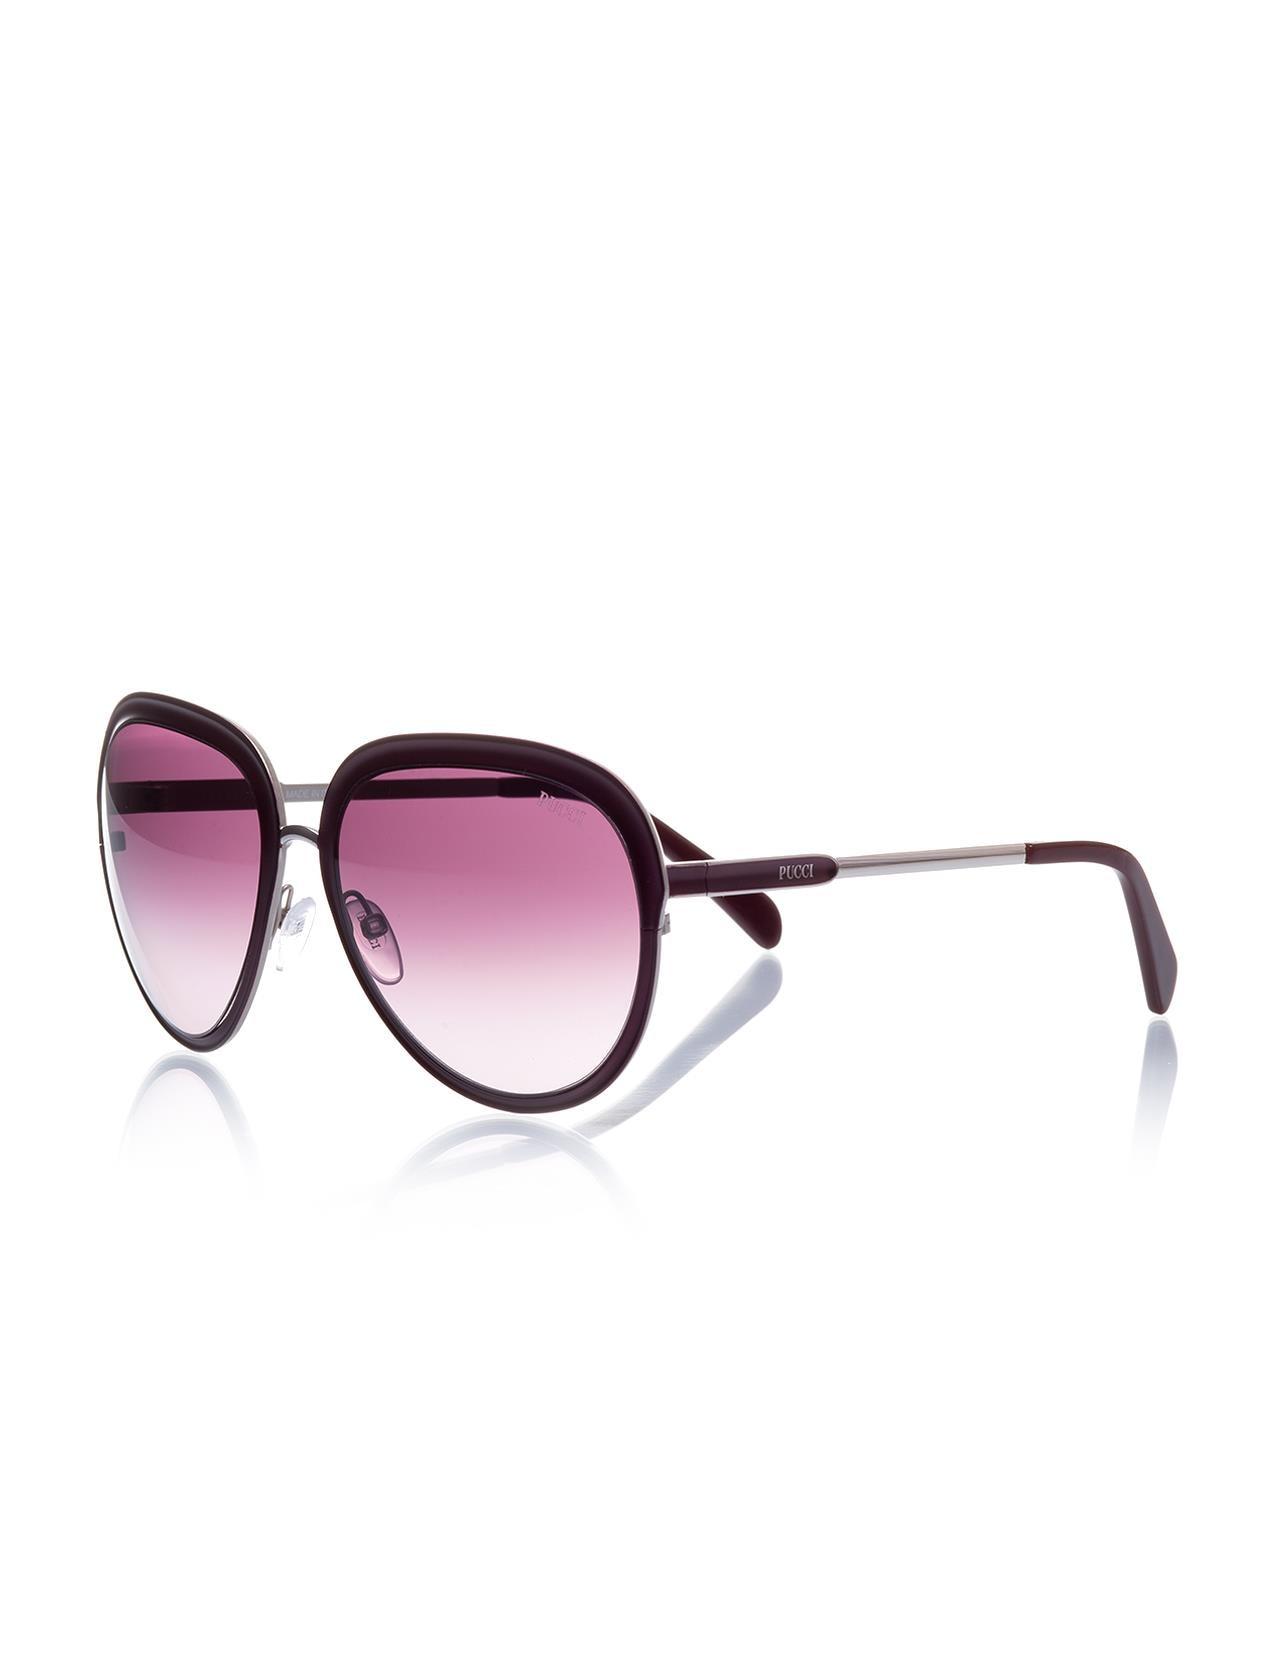 Women's sunglasses ep 0037 69t metal Burgundy organic oval aval 57-18-135 emilio pucci